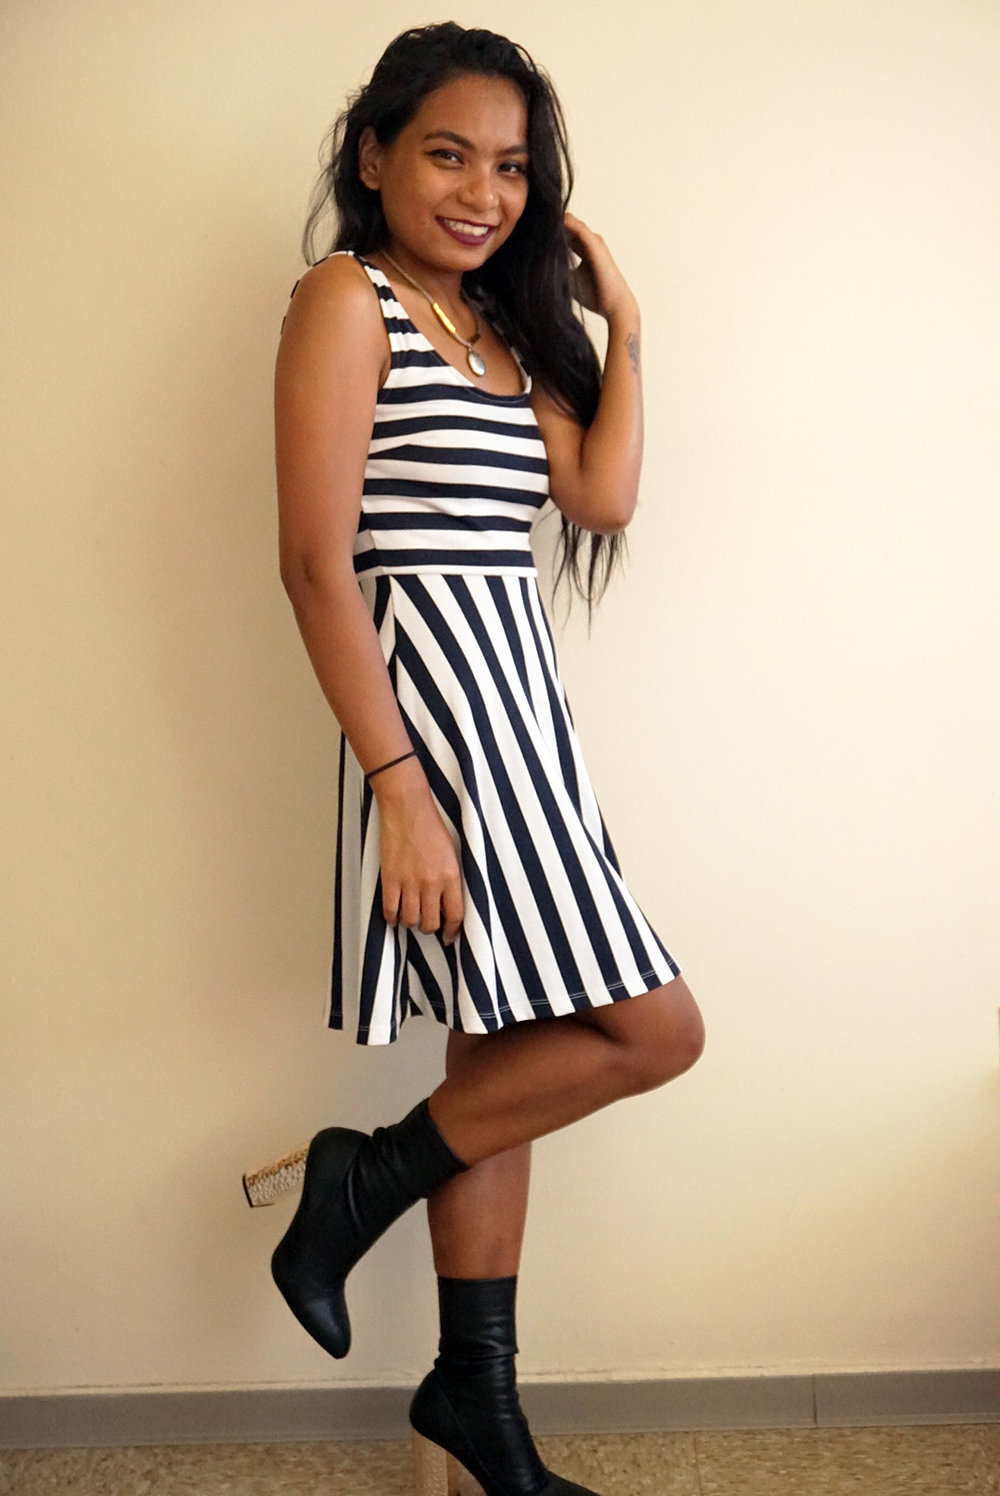 Striped-Dress-Black-Amiclubwear-Boots-Fall-Style-Blogger-LINDATENCHITRAN-7-1616x1080.jpg